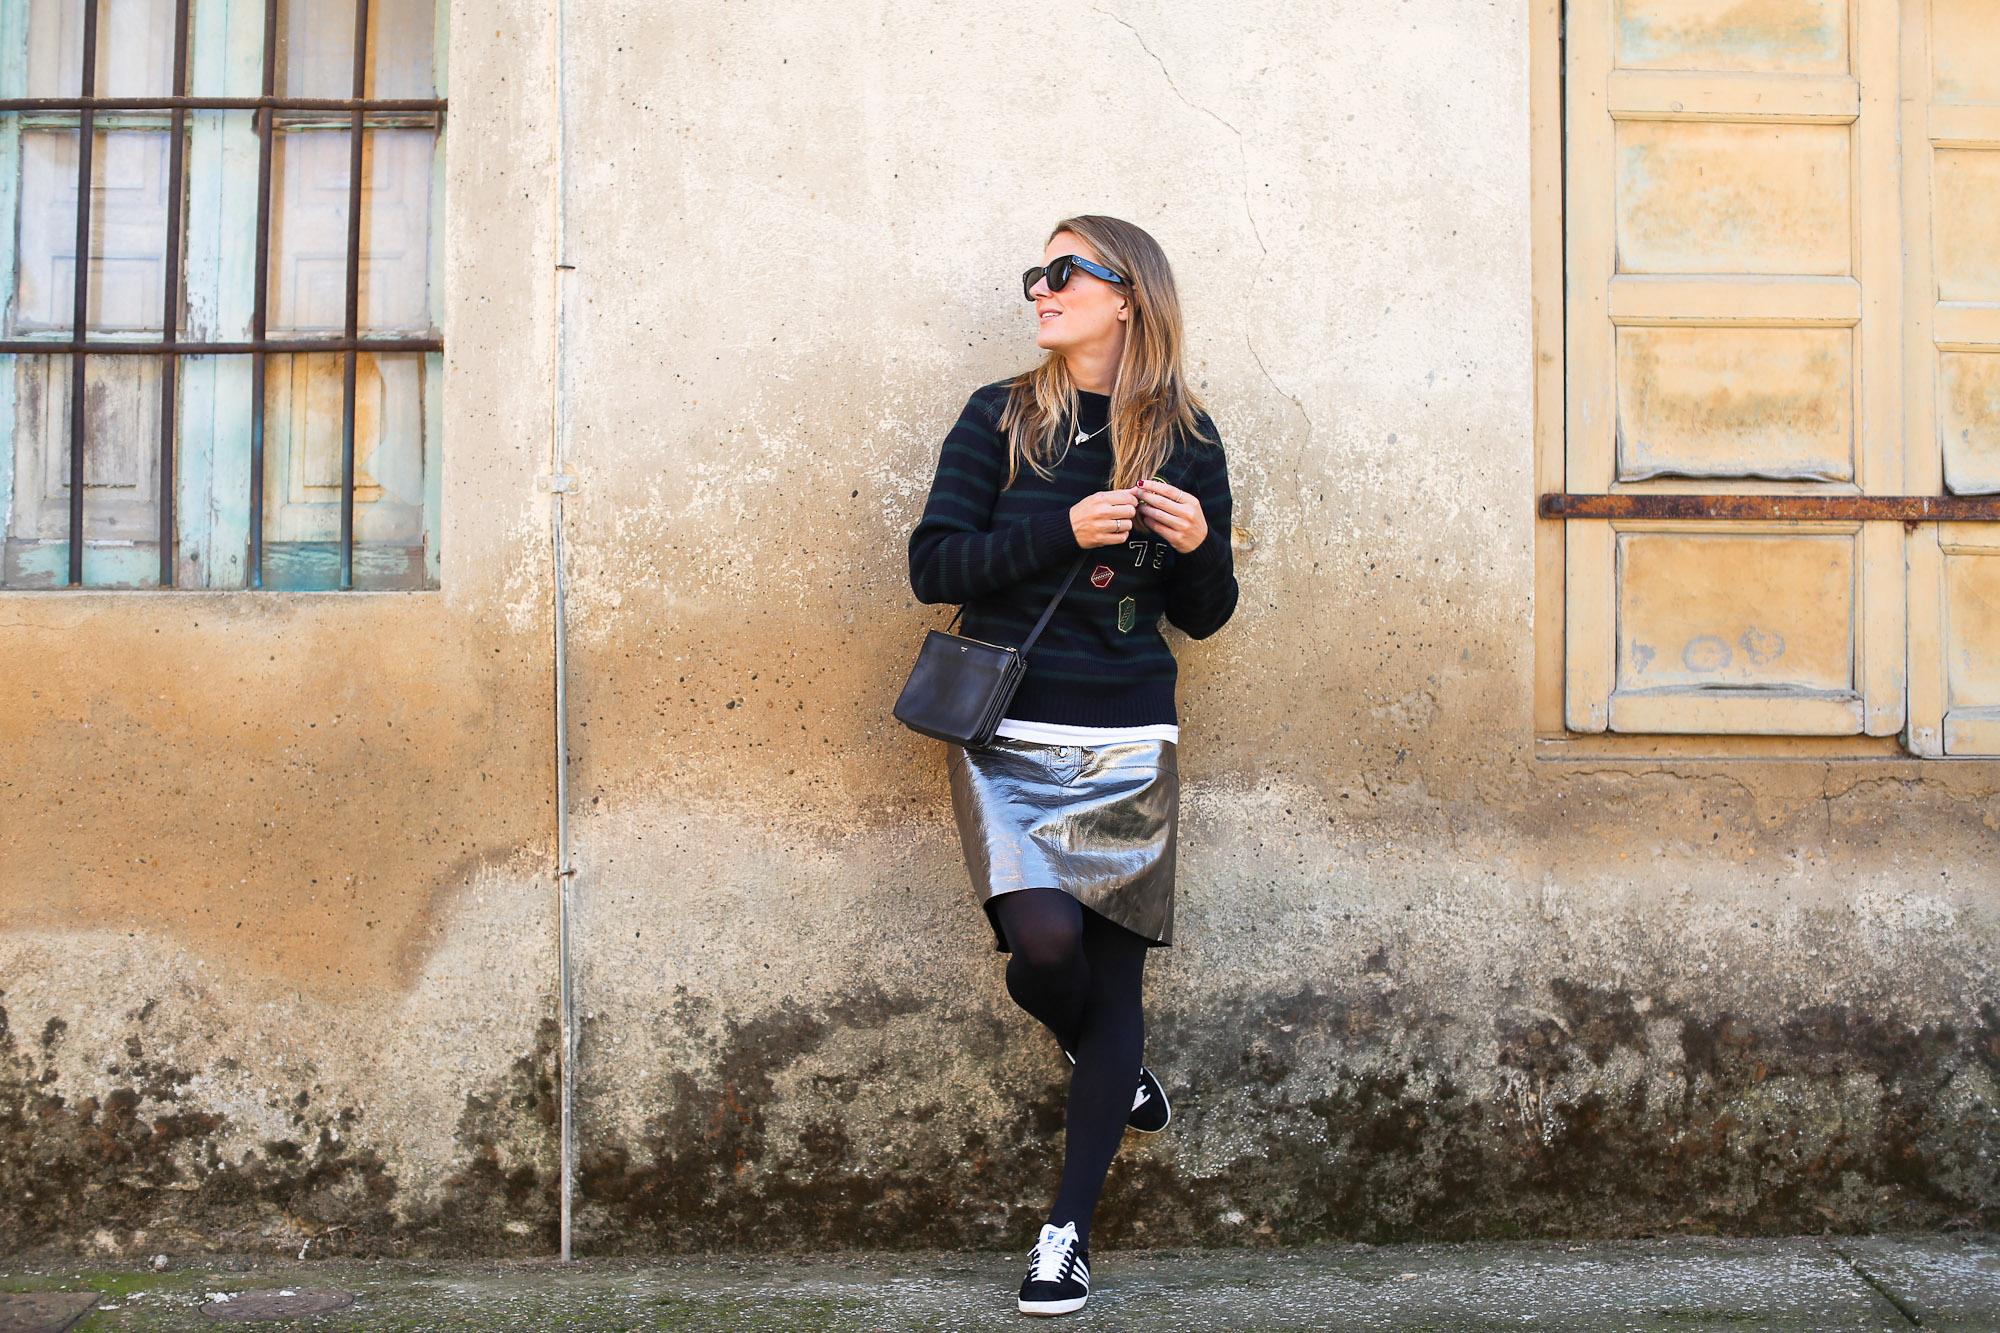 Clochet_streetstyle_fashionblogger_zarametallicleatherskirt_claudiepierlot_stripedknit_adidasgazelle-2